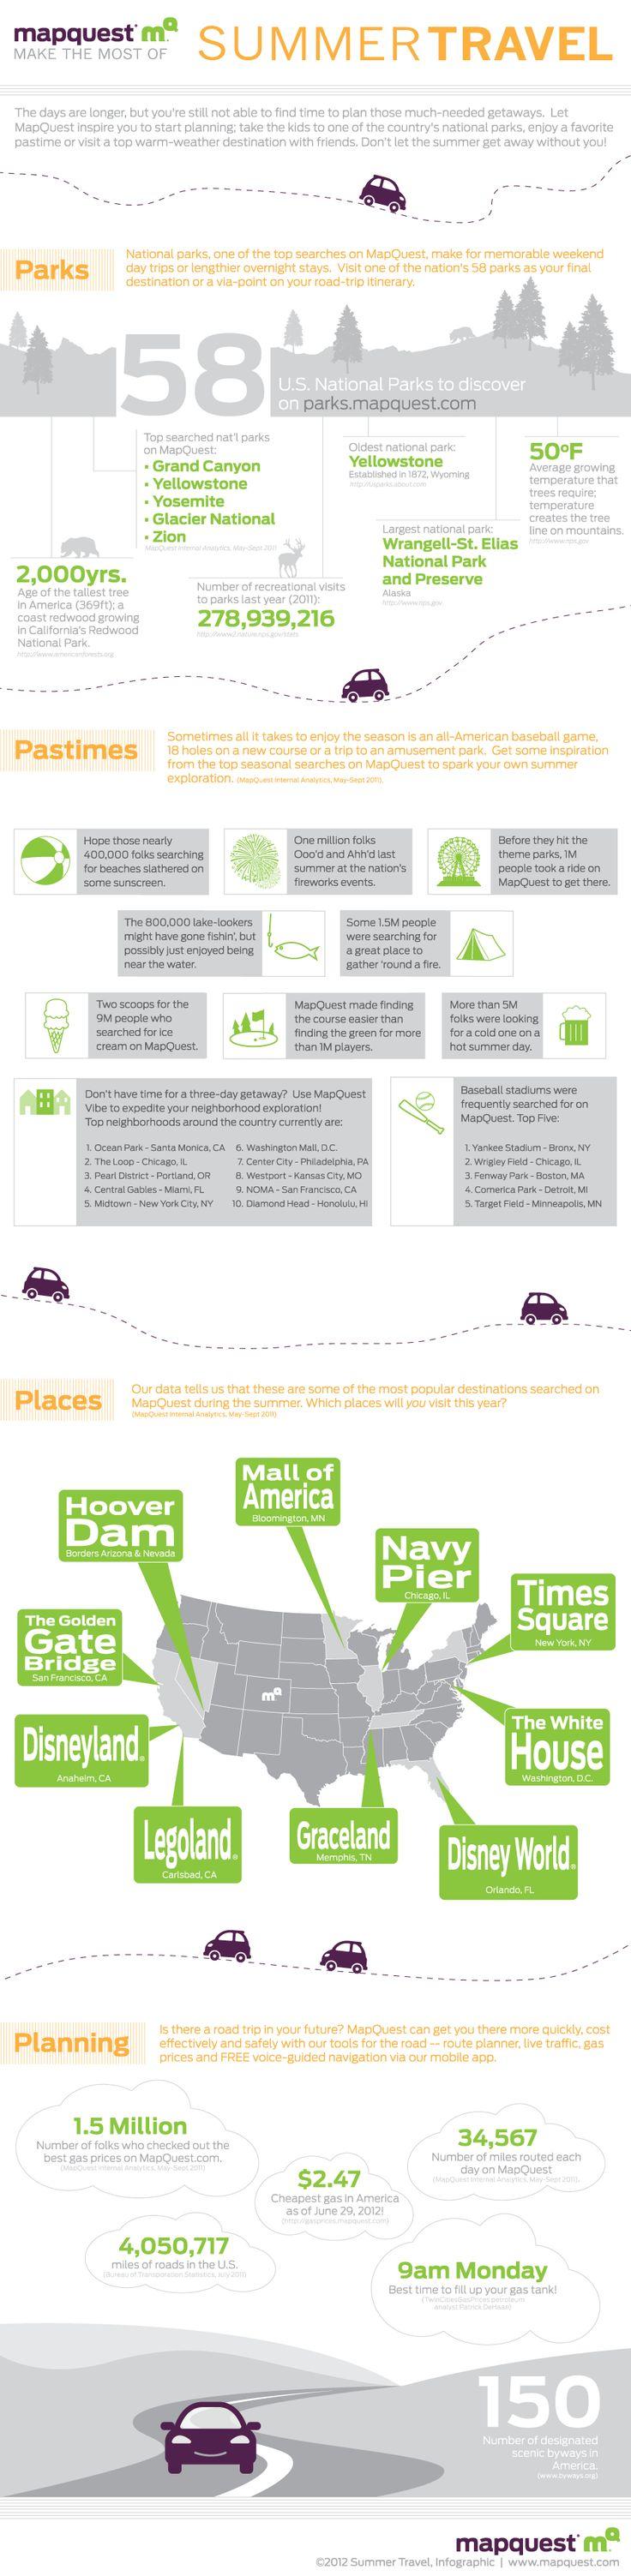 Summer Travel: Celebrity Travel, Fyi Infographic, Daily Infographic, Summer Vacations, Summertravel, Travel Infographic, 2012 Infographic, Summer Travel, Travel Ideas